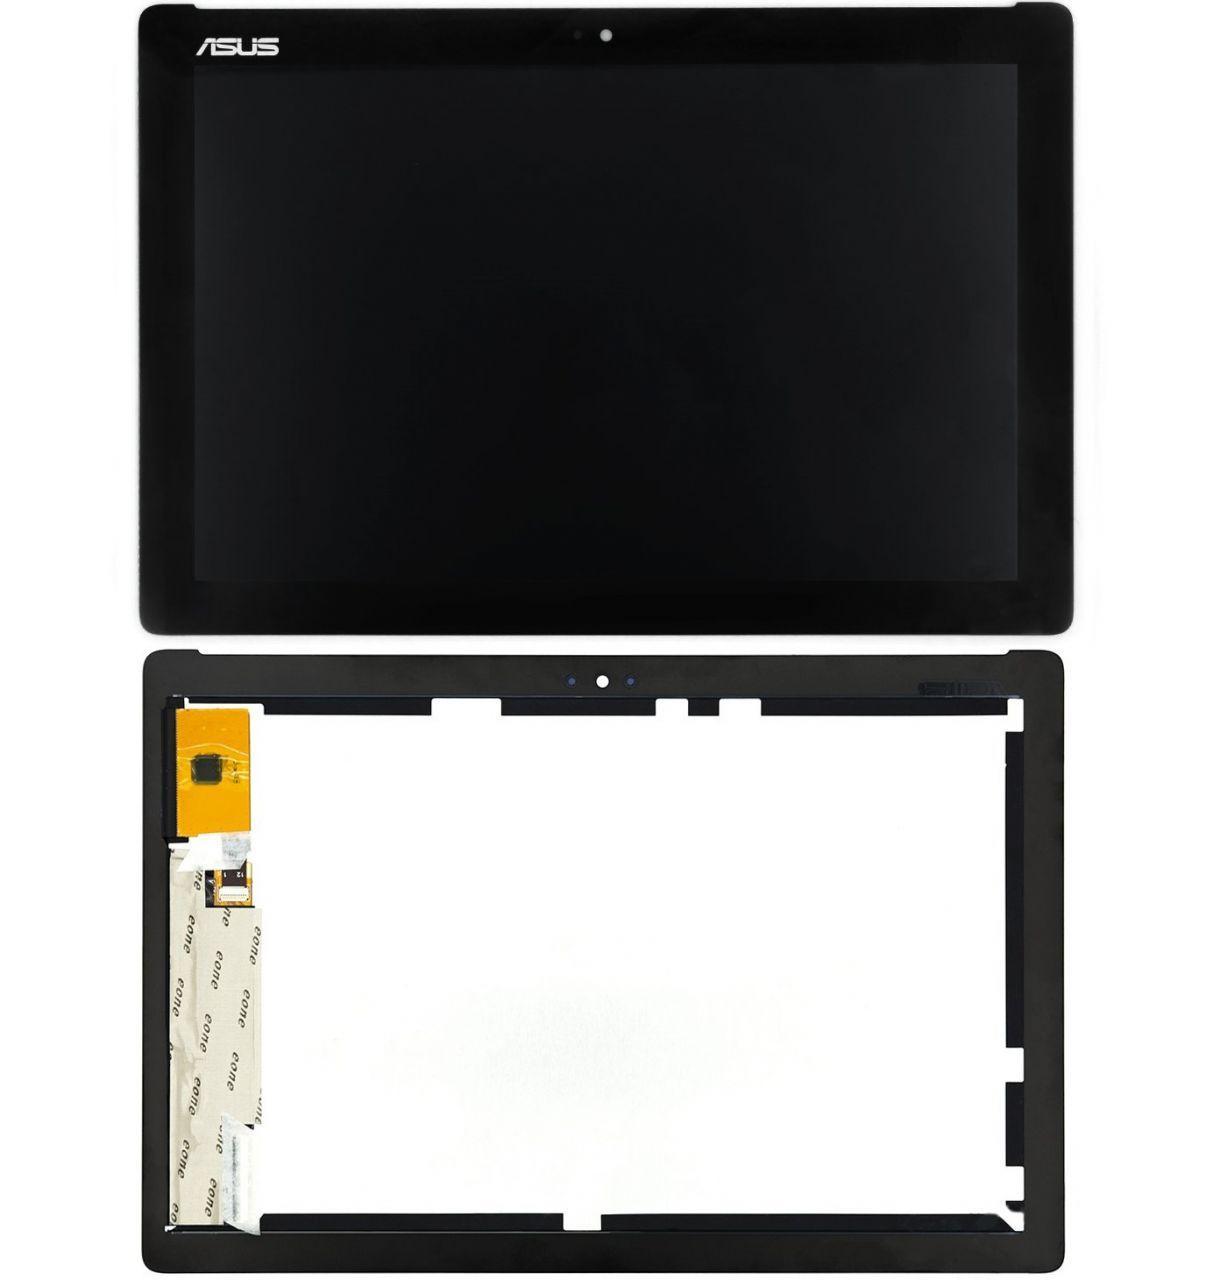 Дисплей для планшета Asus ZenPad 10 Z300CNG (зеленый шлейф, #CLAT101WR61 XG, FW-AS010102-V1) + Touchscreen